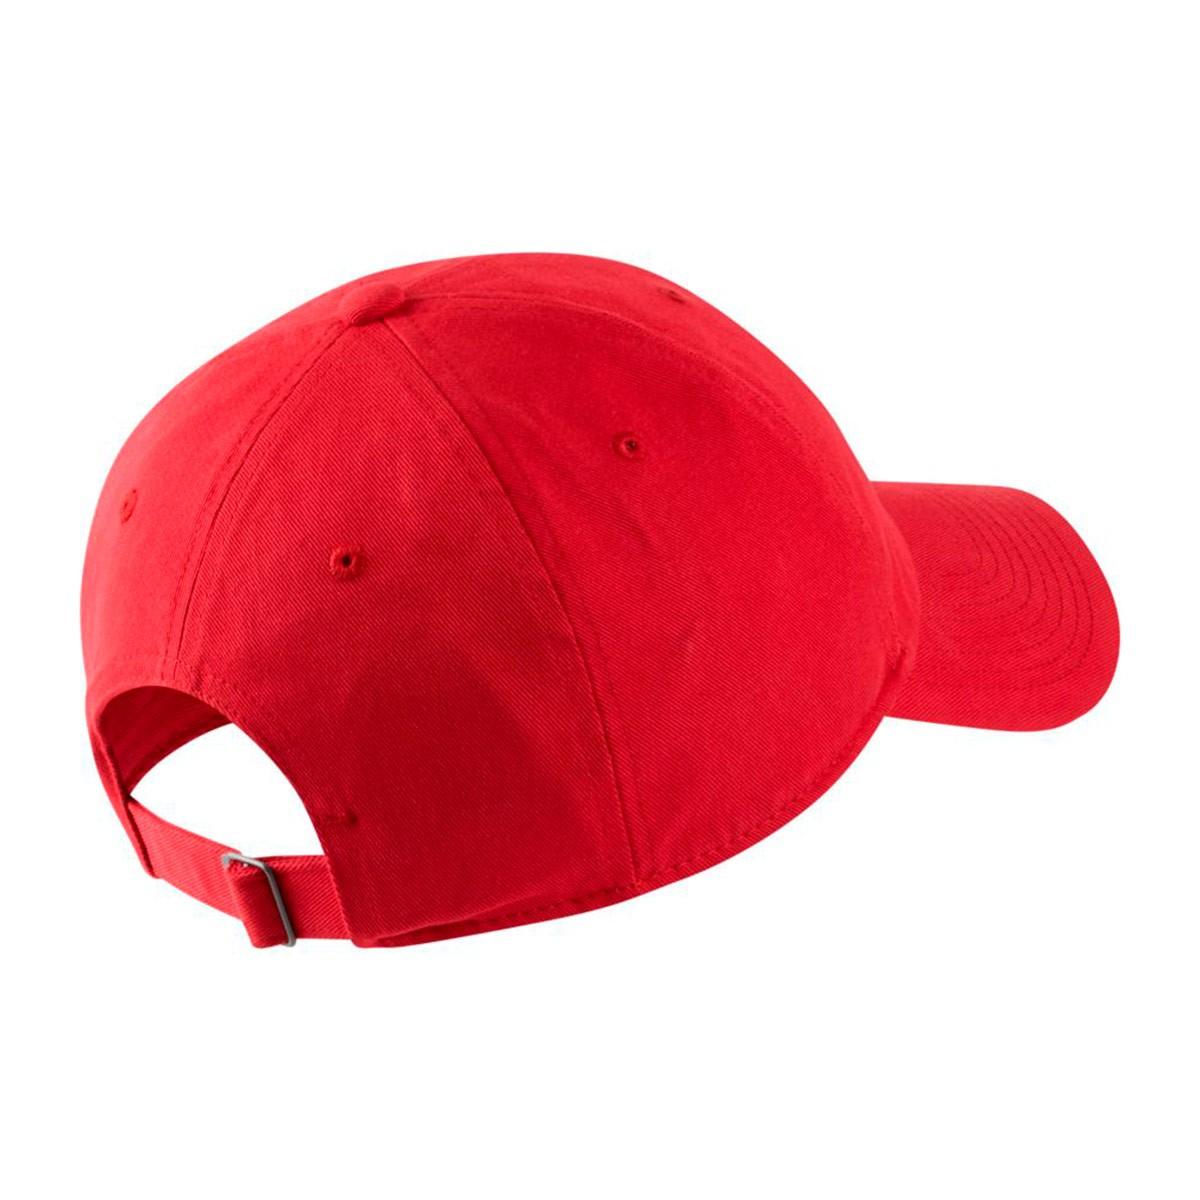 Cap Nike Portugal 2018-2019 Gym red-Metallic gold - Football store ... 052afe1ed19